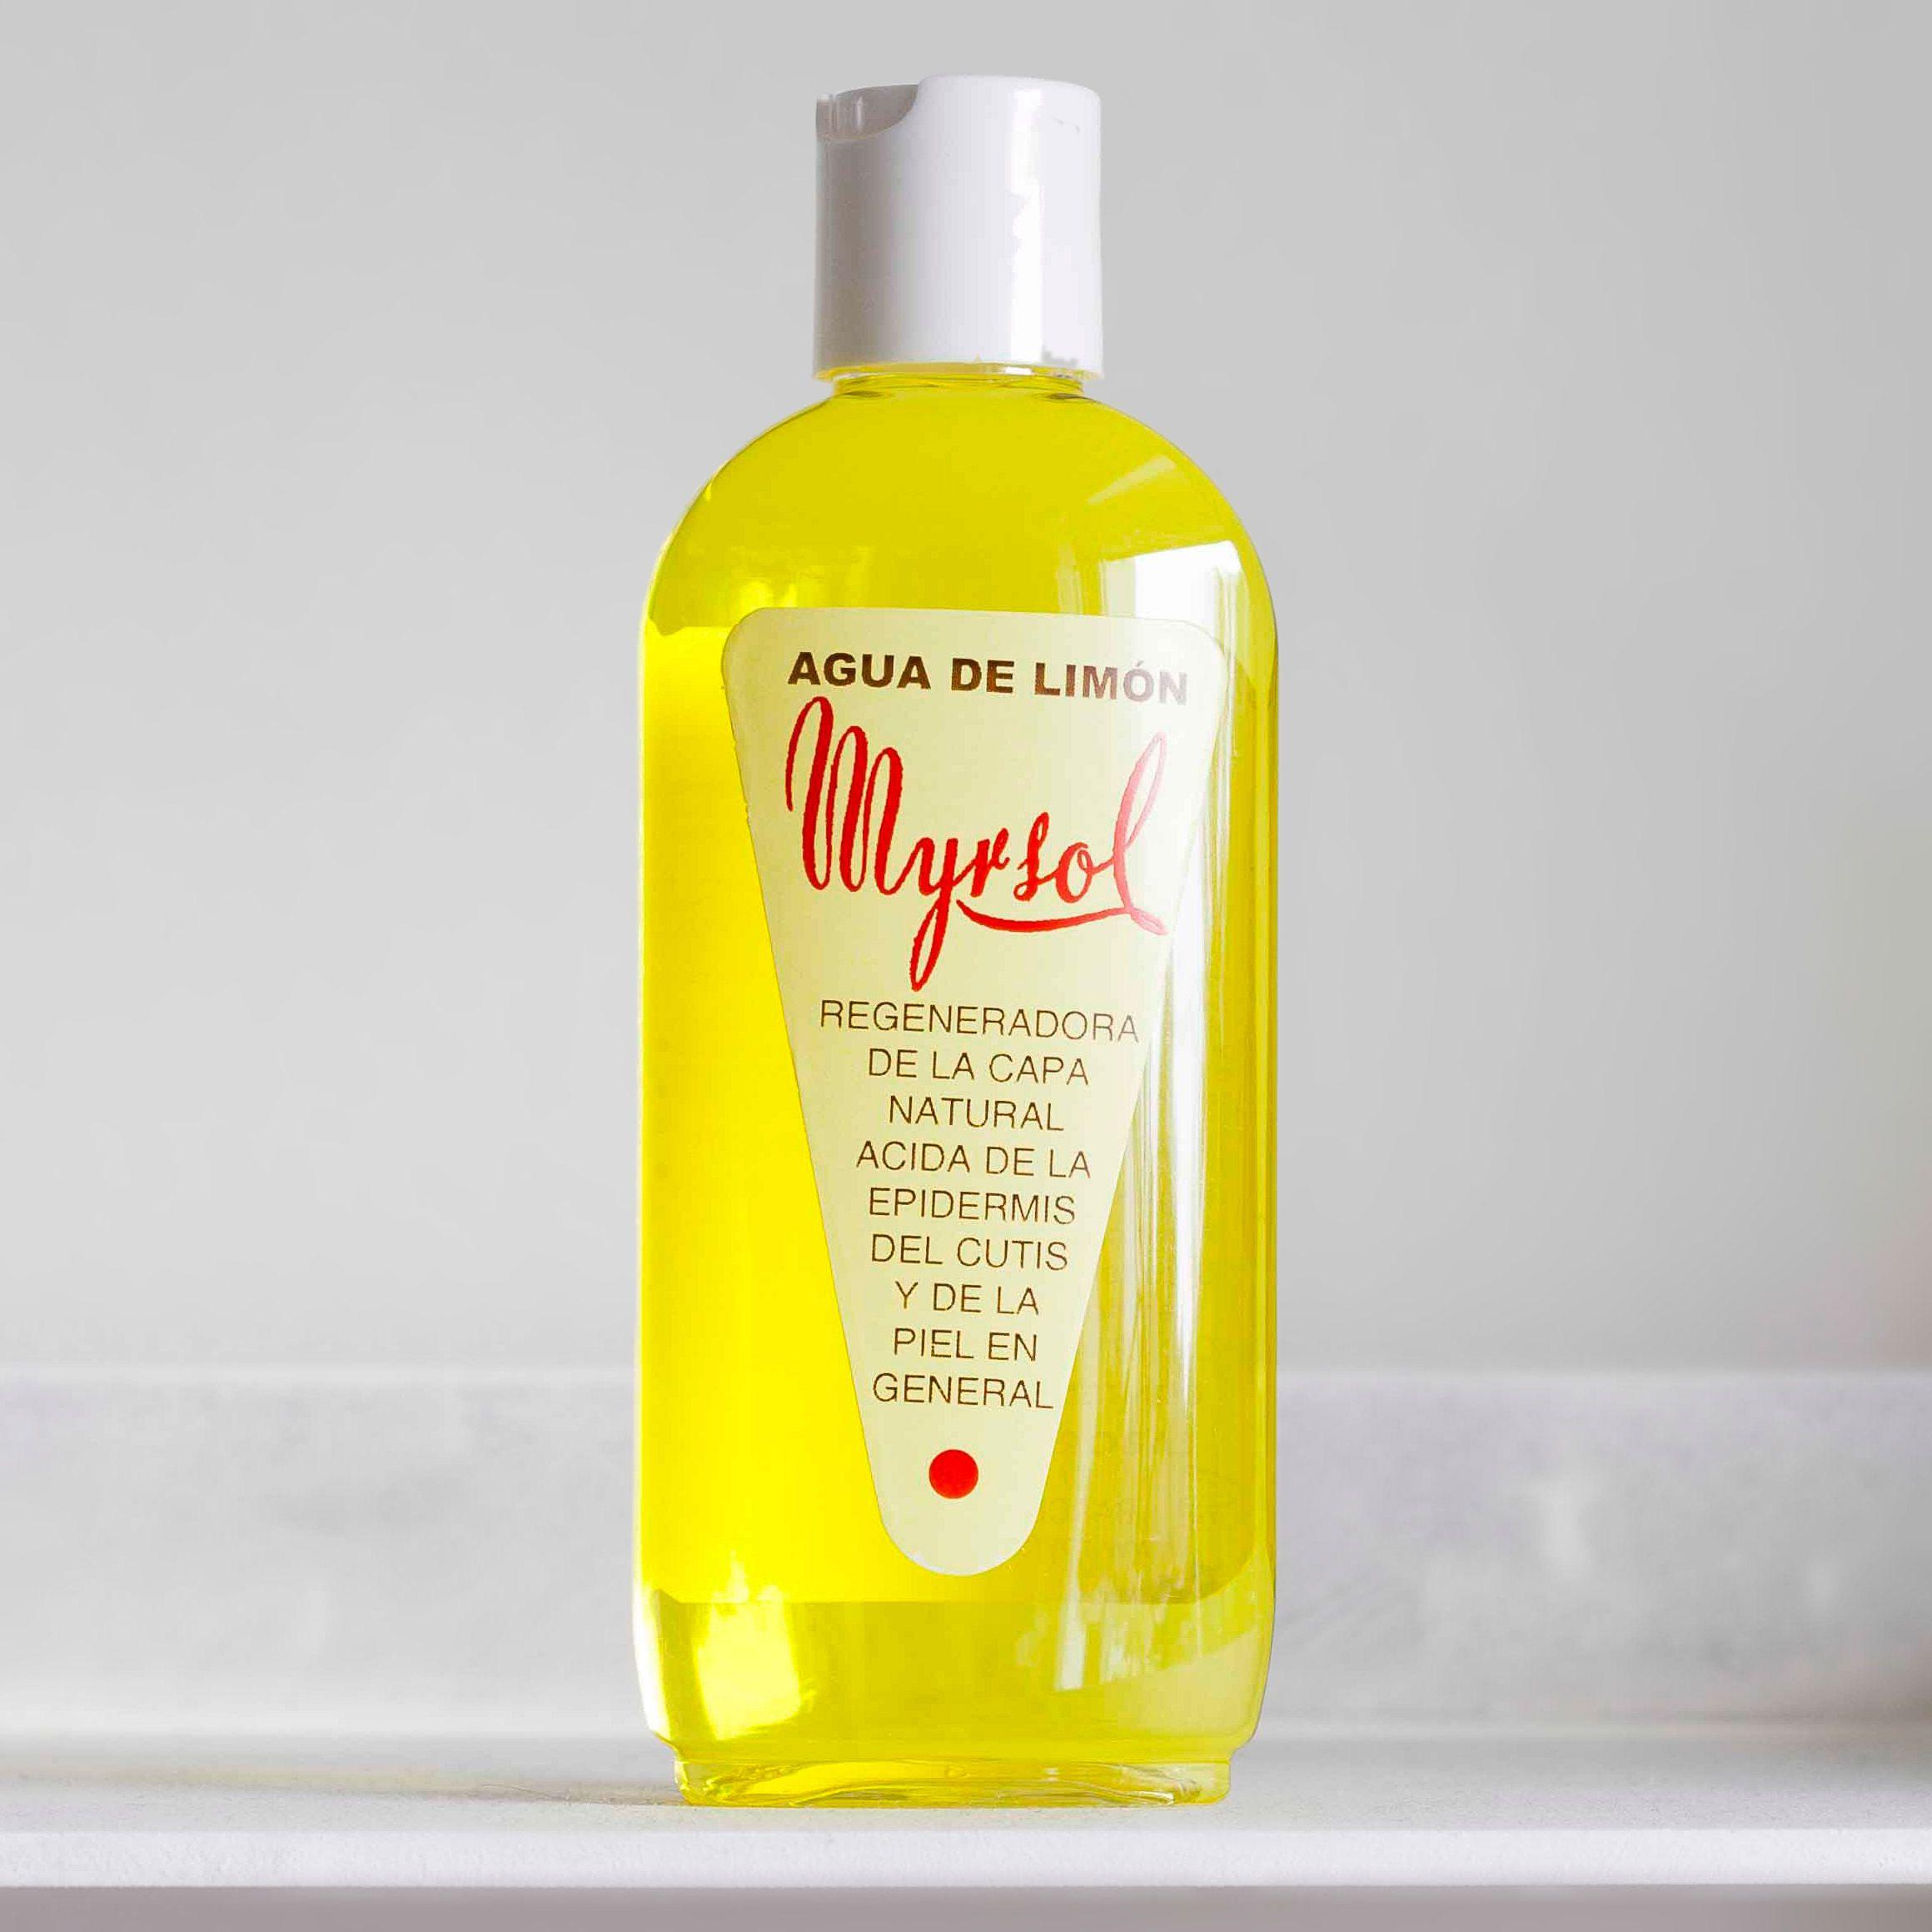 Myrsol Agua de Limón w plastikowej butelce (zdjęcie Dzik i Borsuk)